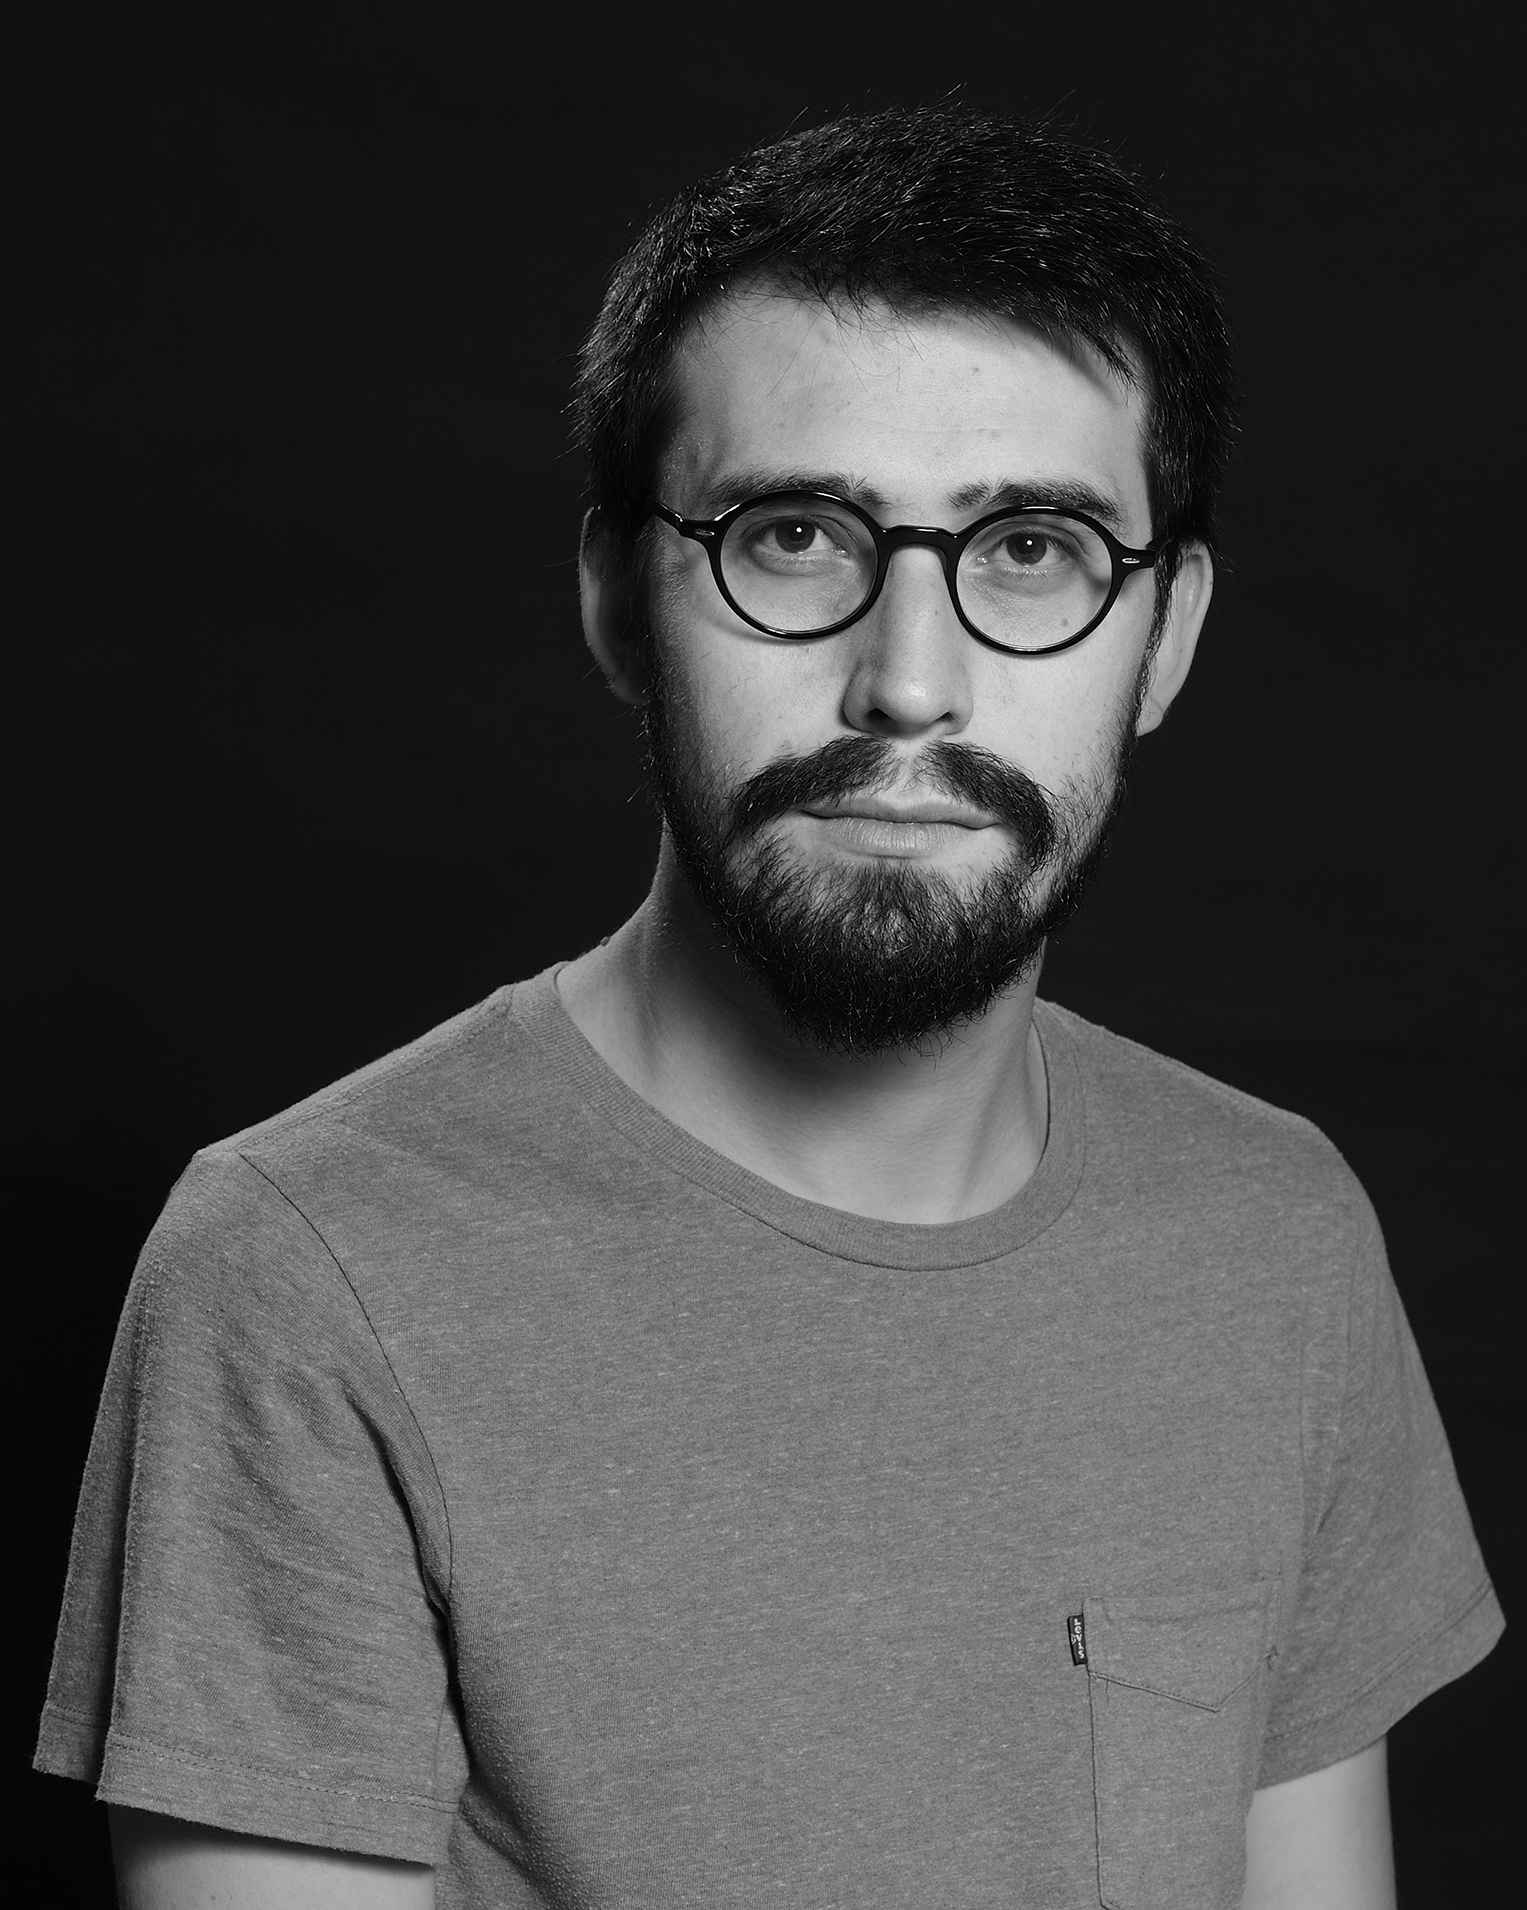 Осман Наил Доган (Osman Nail Doğan)